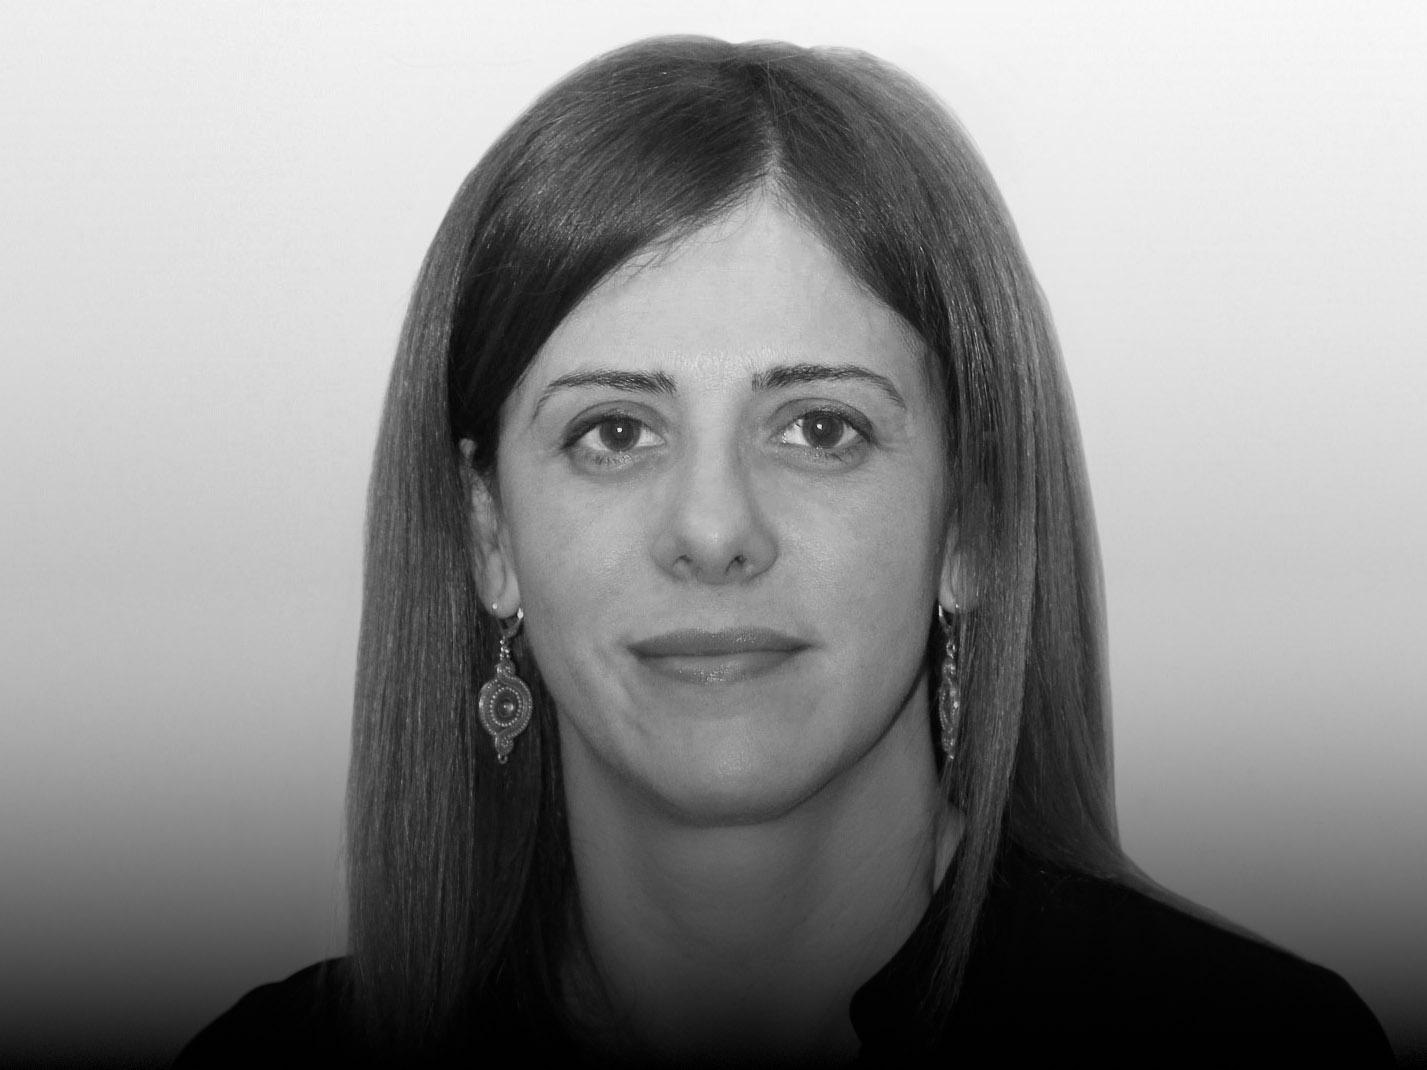 Image of Carmen Botelho